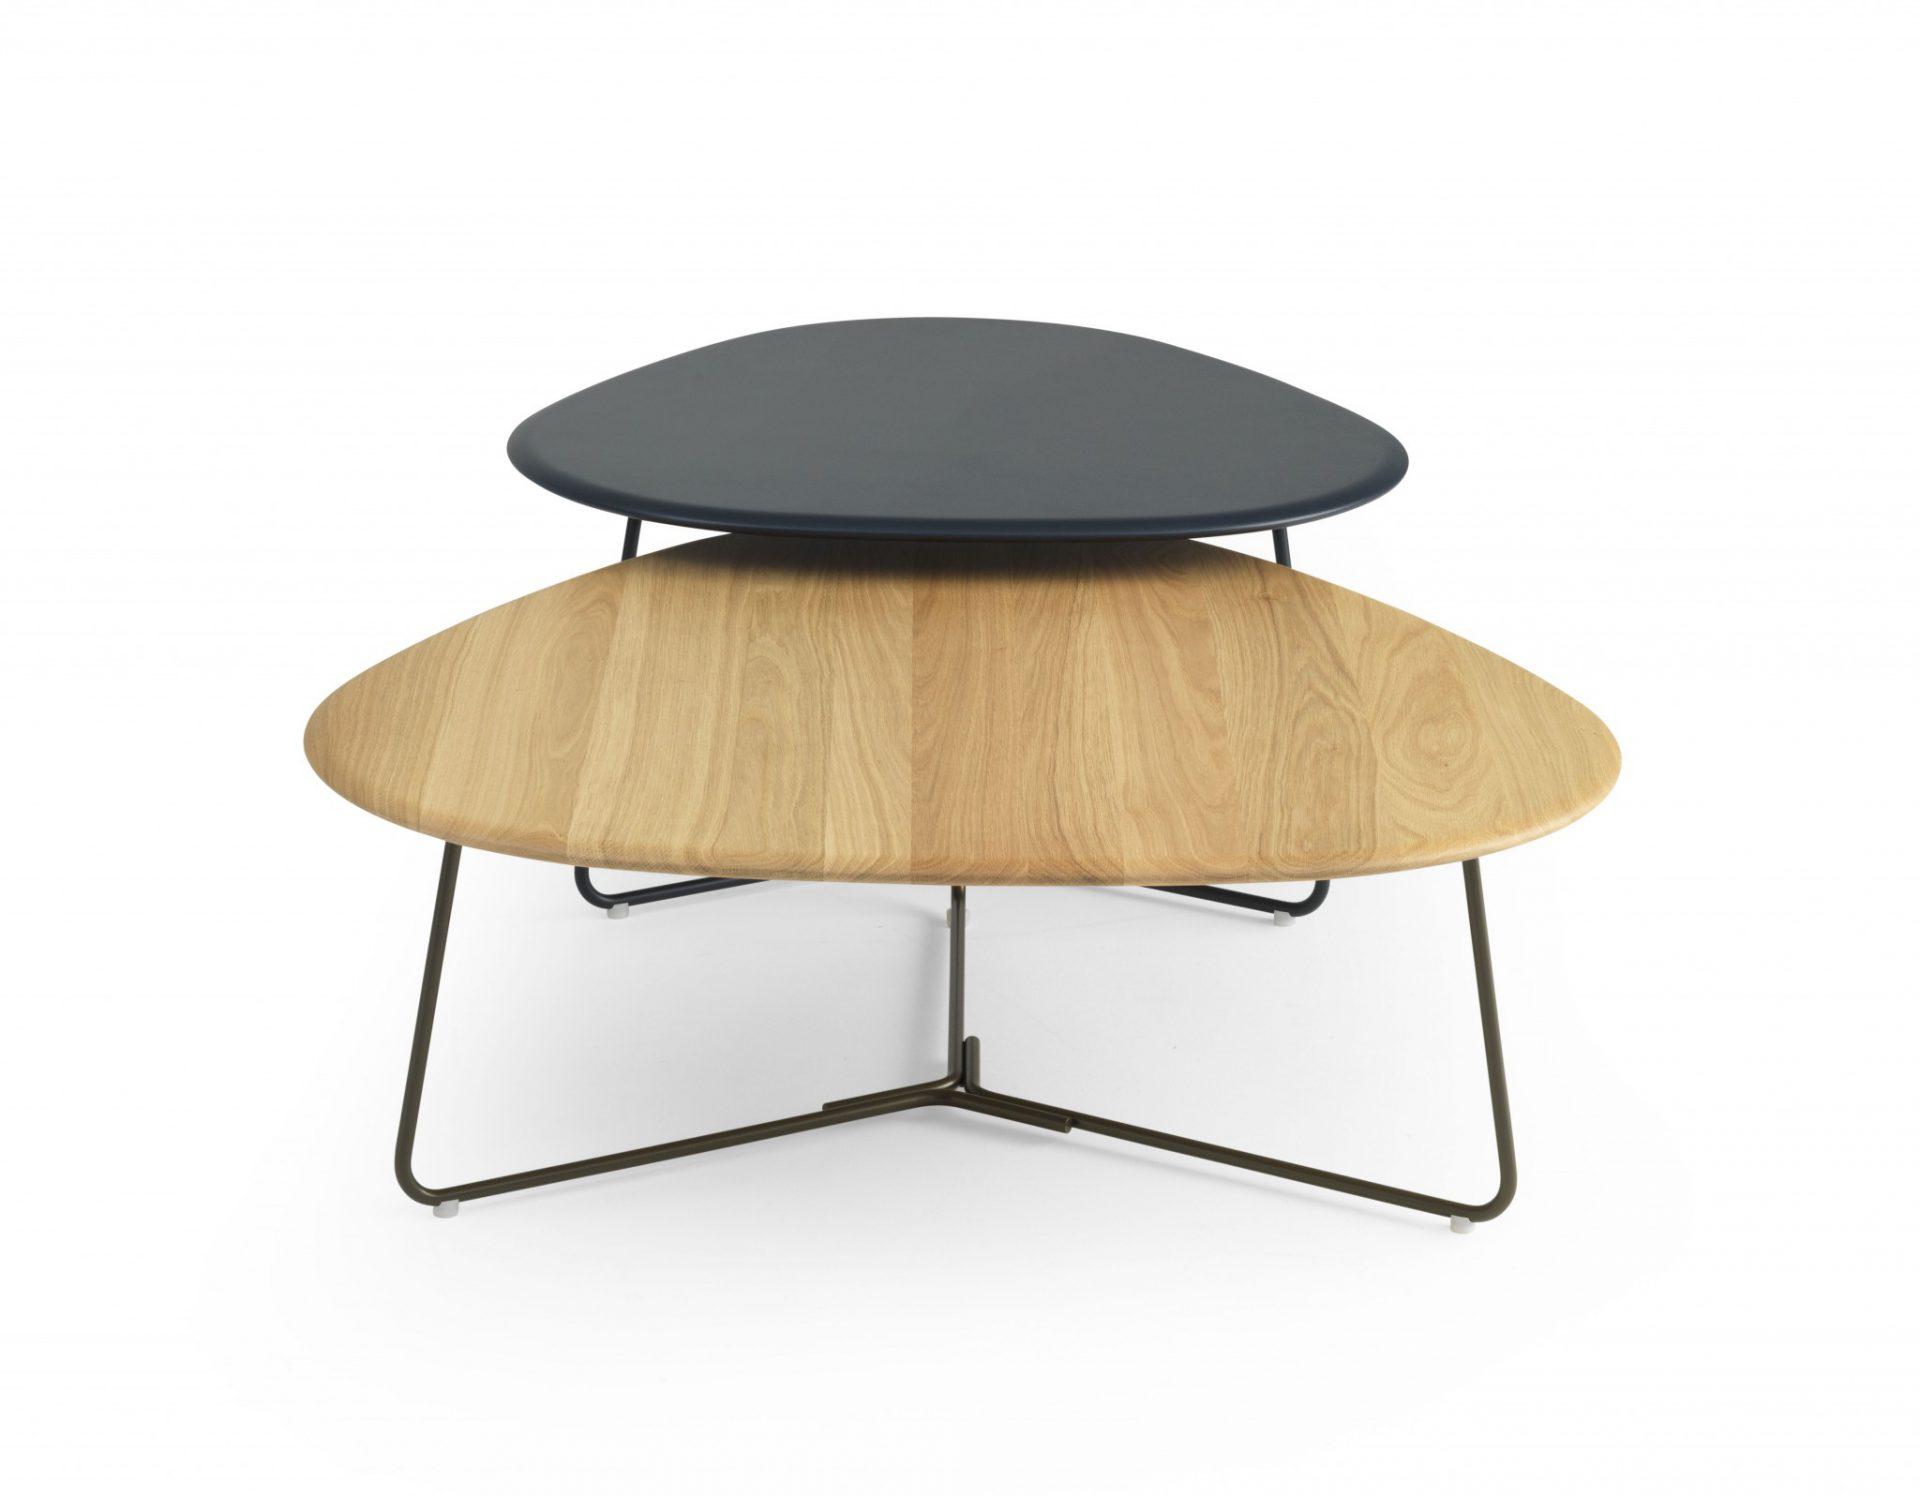 Tripod tafels